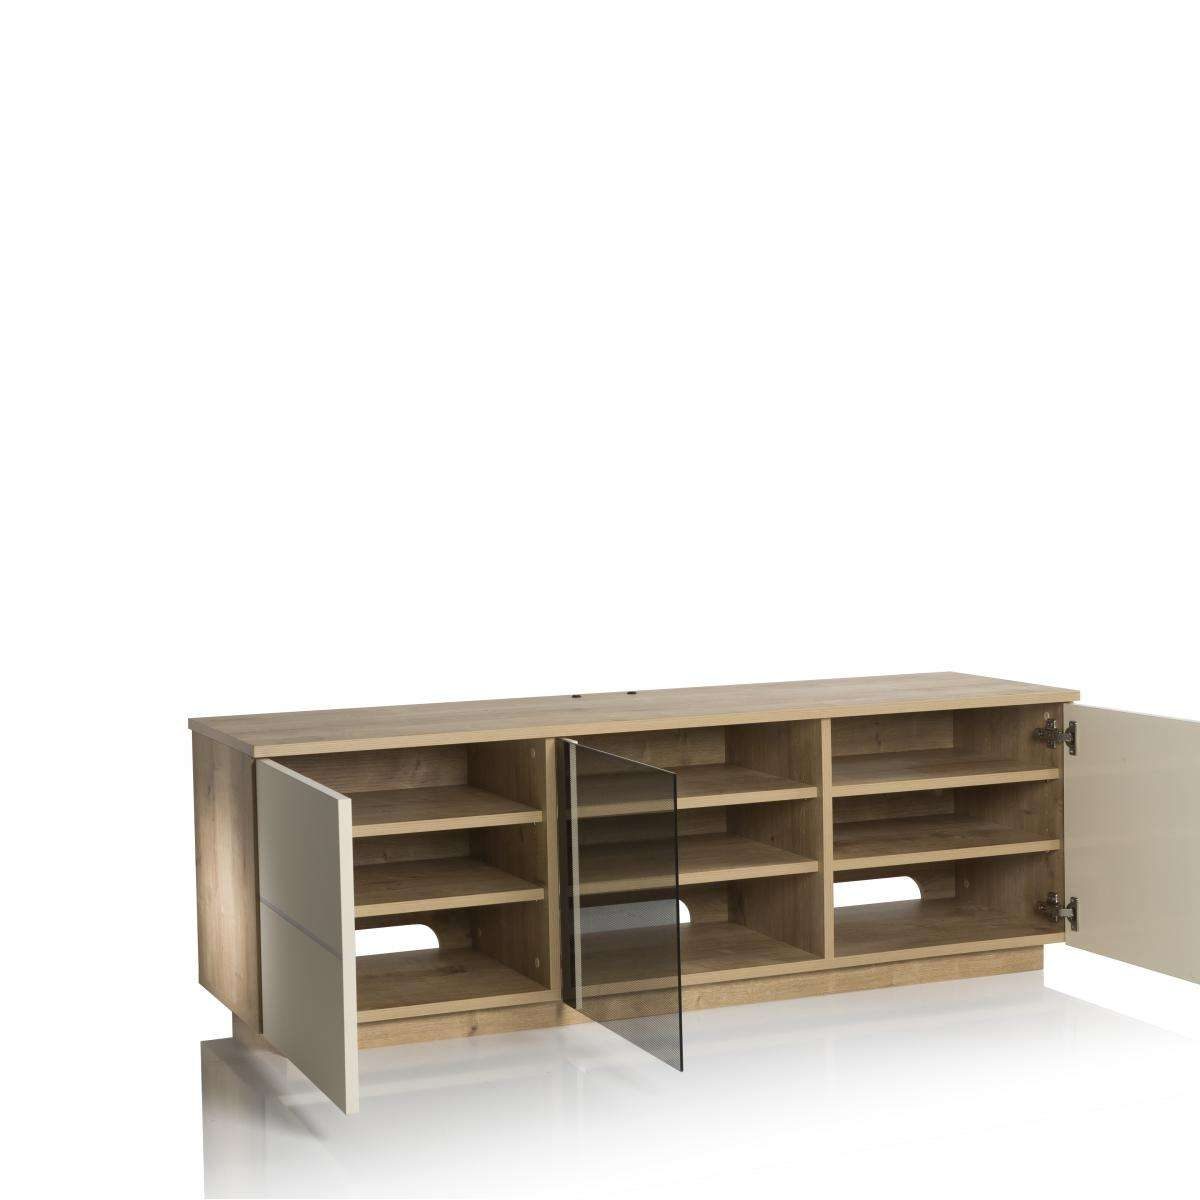 New London 150Cm Tv Cabinet Oak /cream | Nldn Oak Cr Inside Cream High Gloss Tv Cabinets (View 10 of 20)